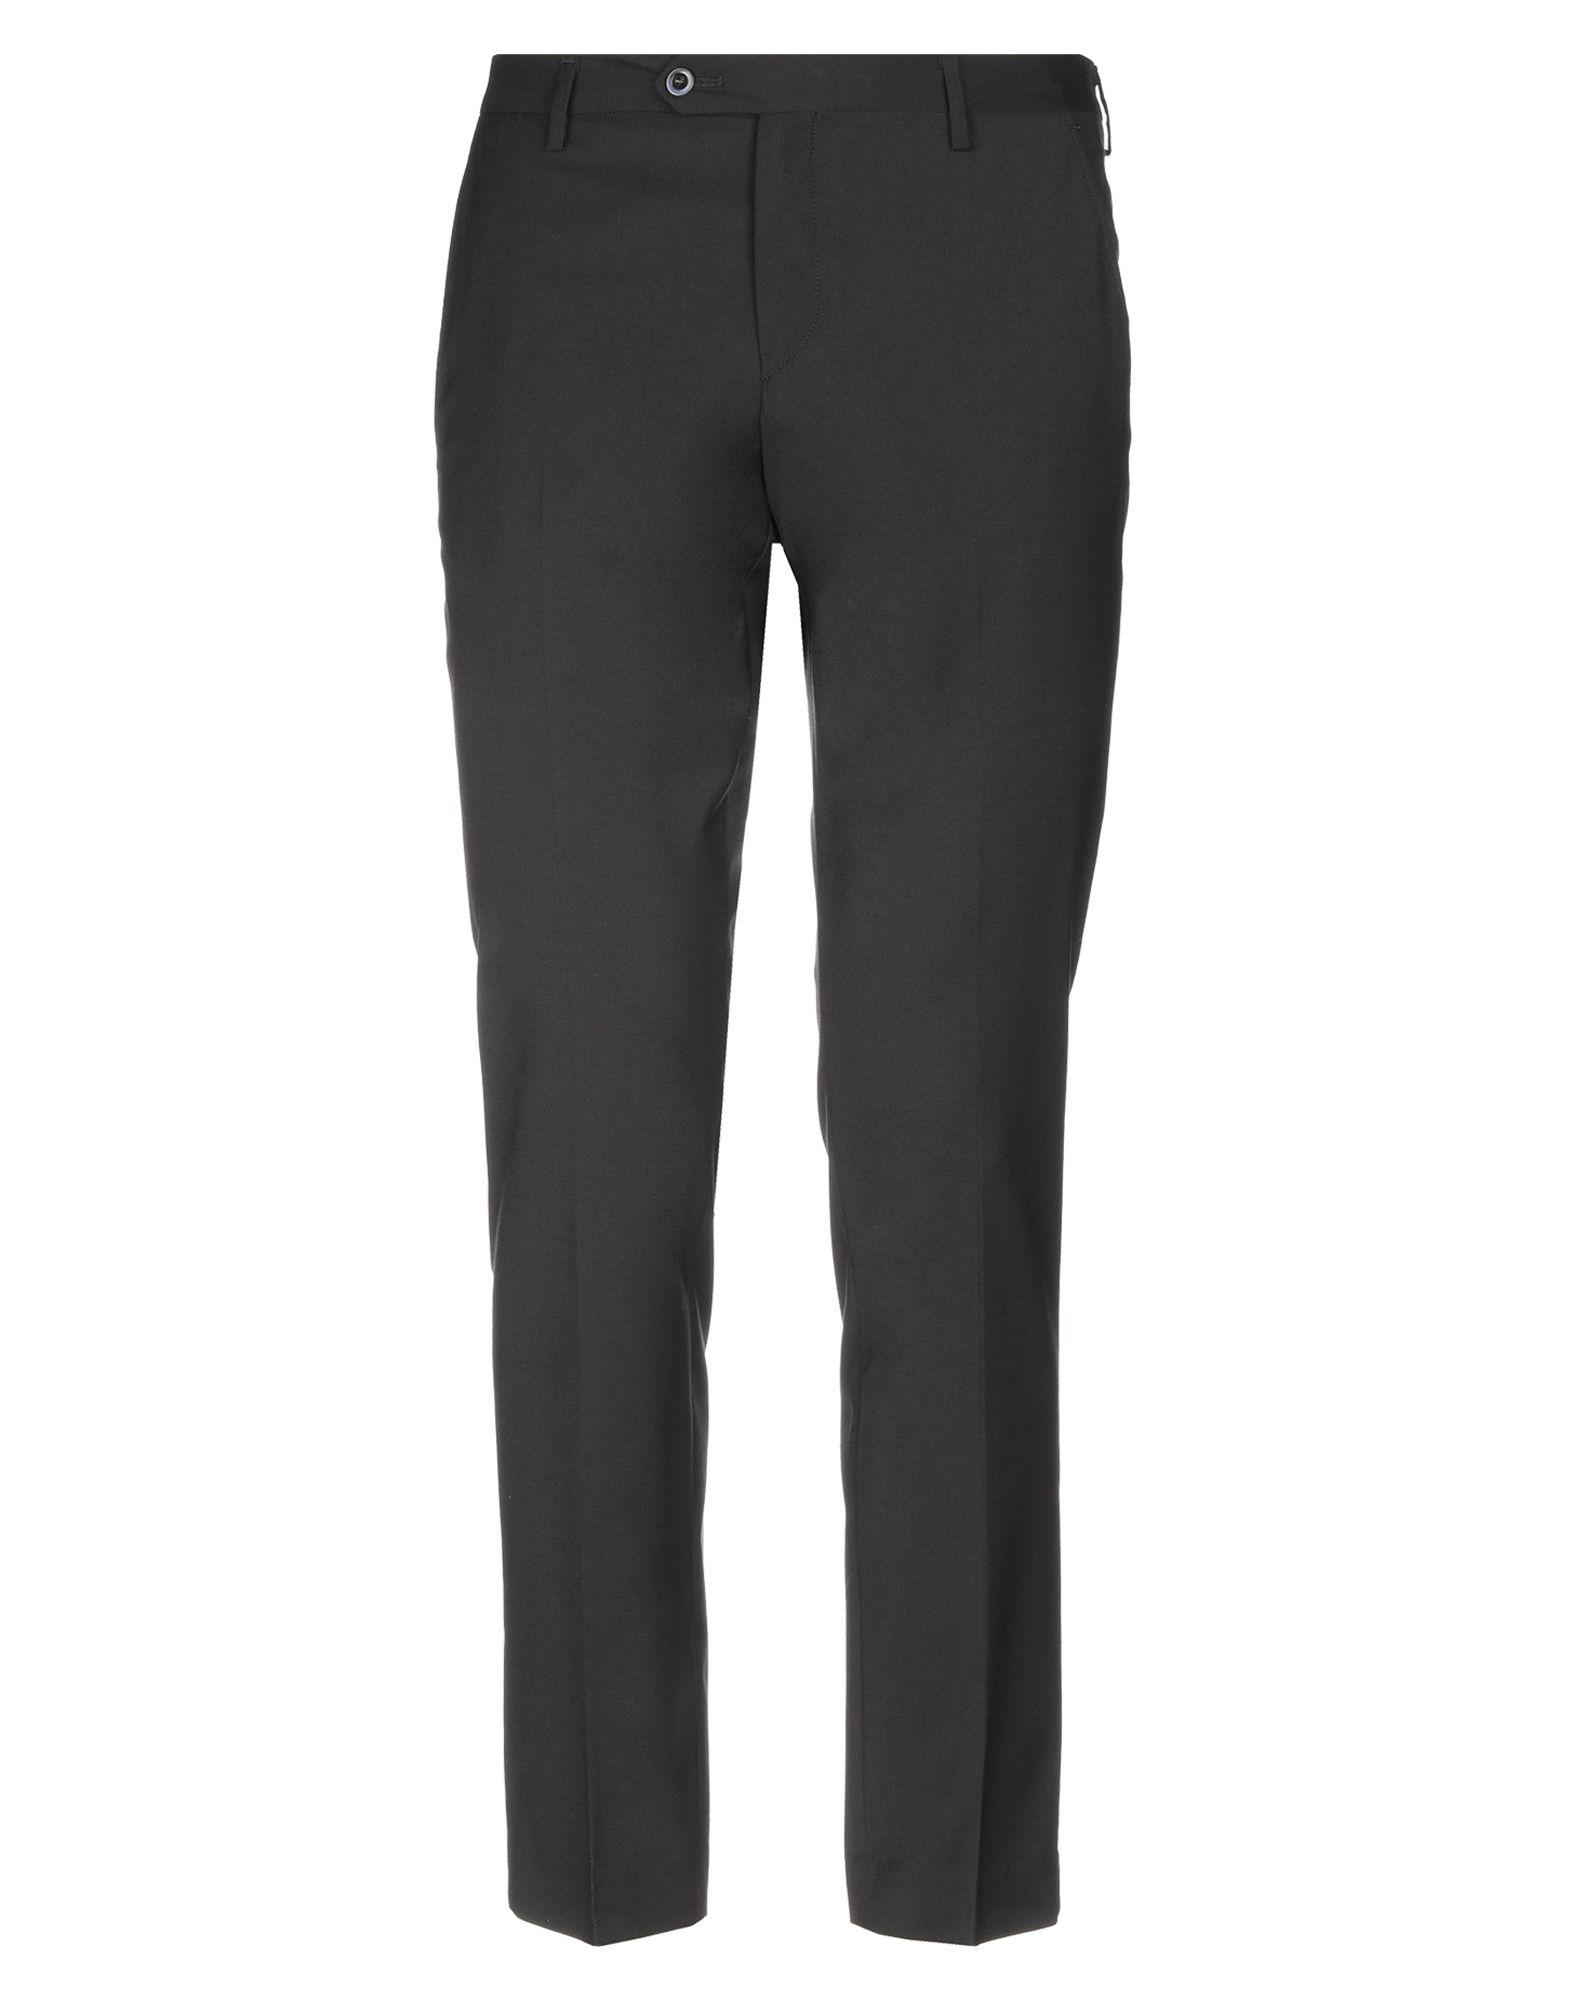 MASSIMO BRUNELLI Повседневные брюки женские брюки spain massimo dutti 6623923 massimo dutti